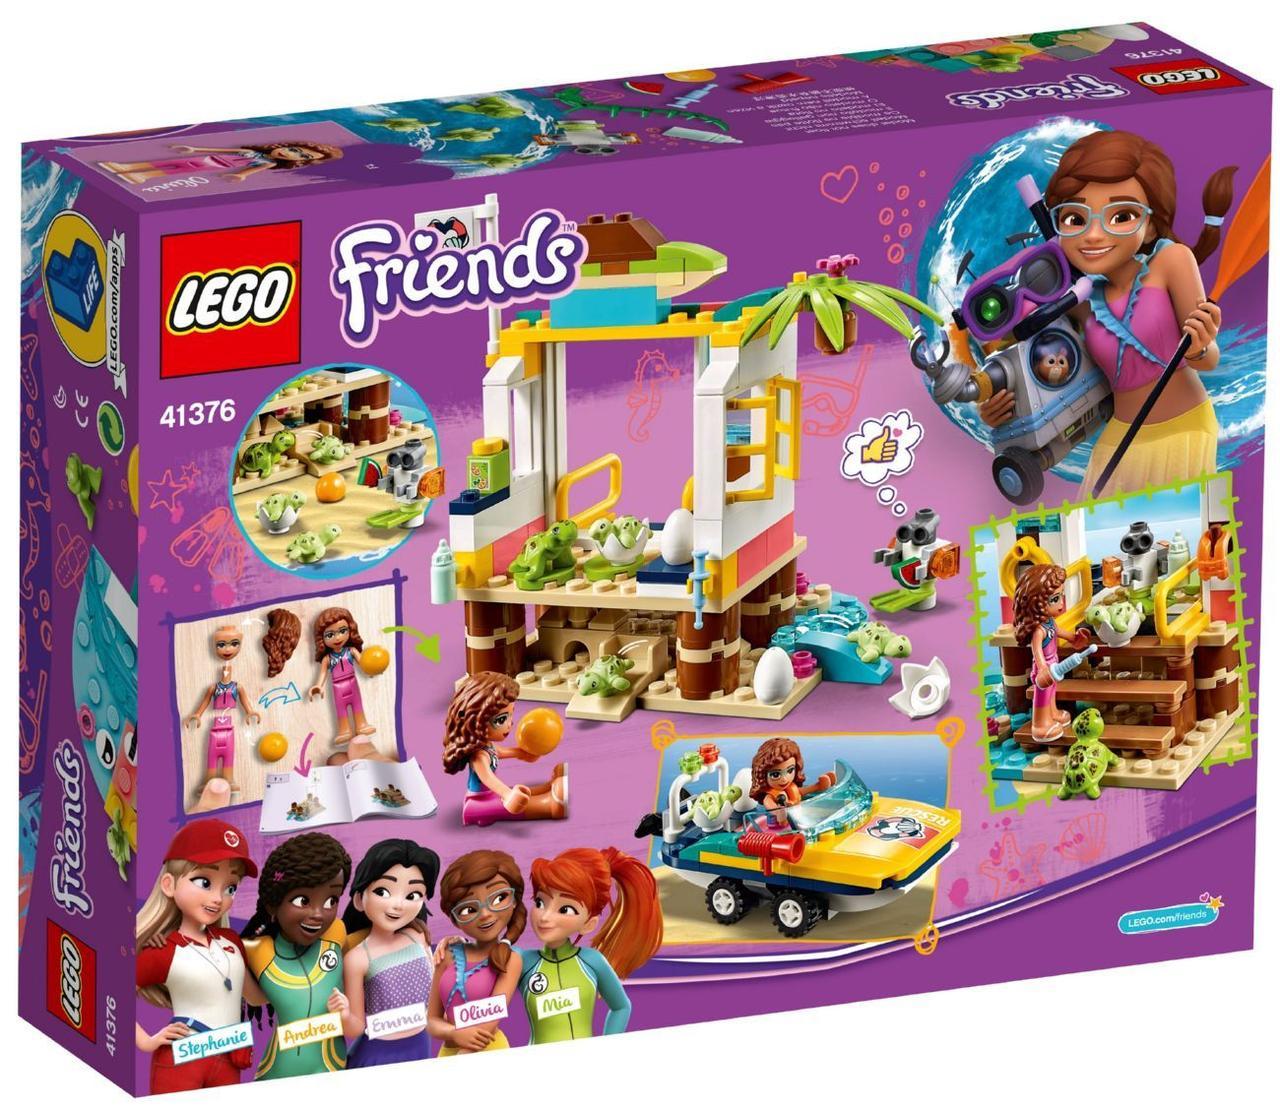 Lego Friends Порятунок черепах 41376